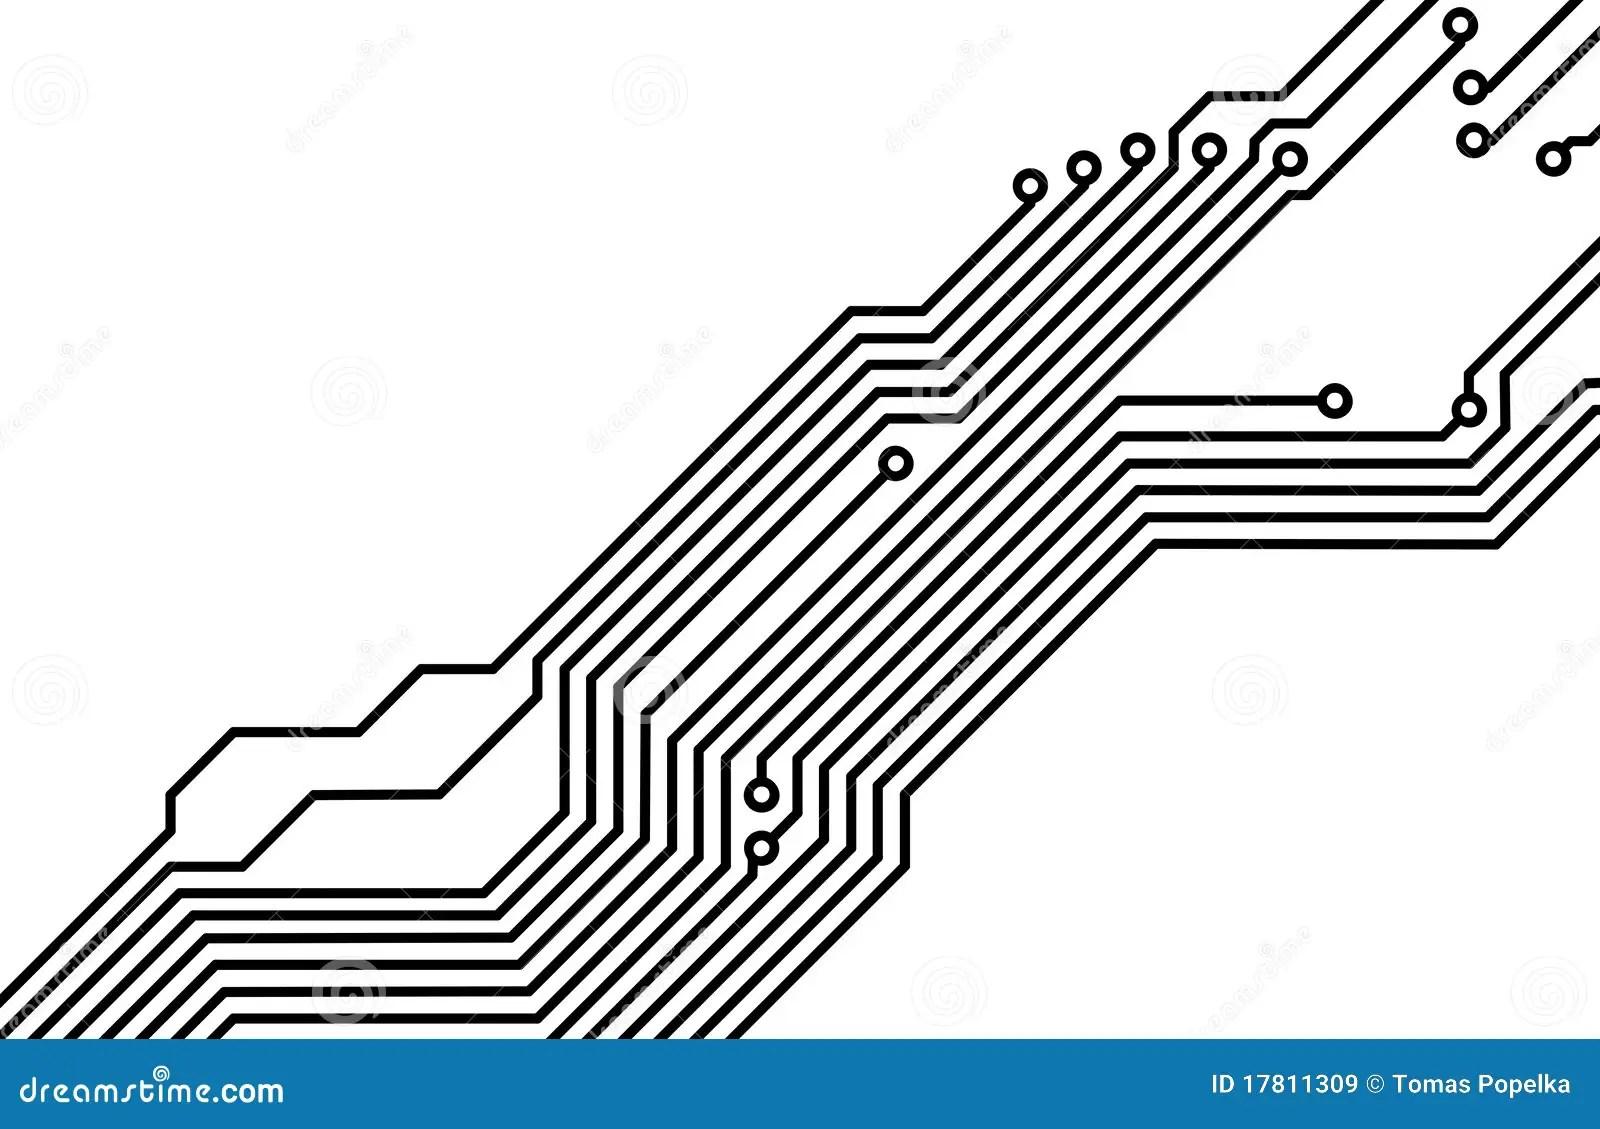 Pcb Printed Circuit Board 8 Stock Illustration